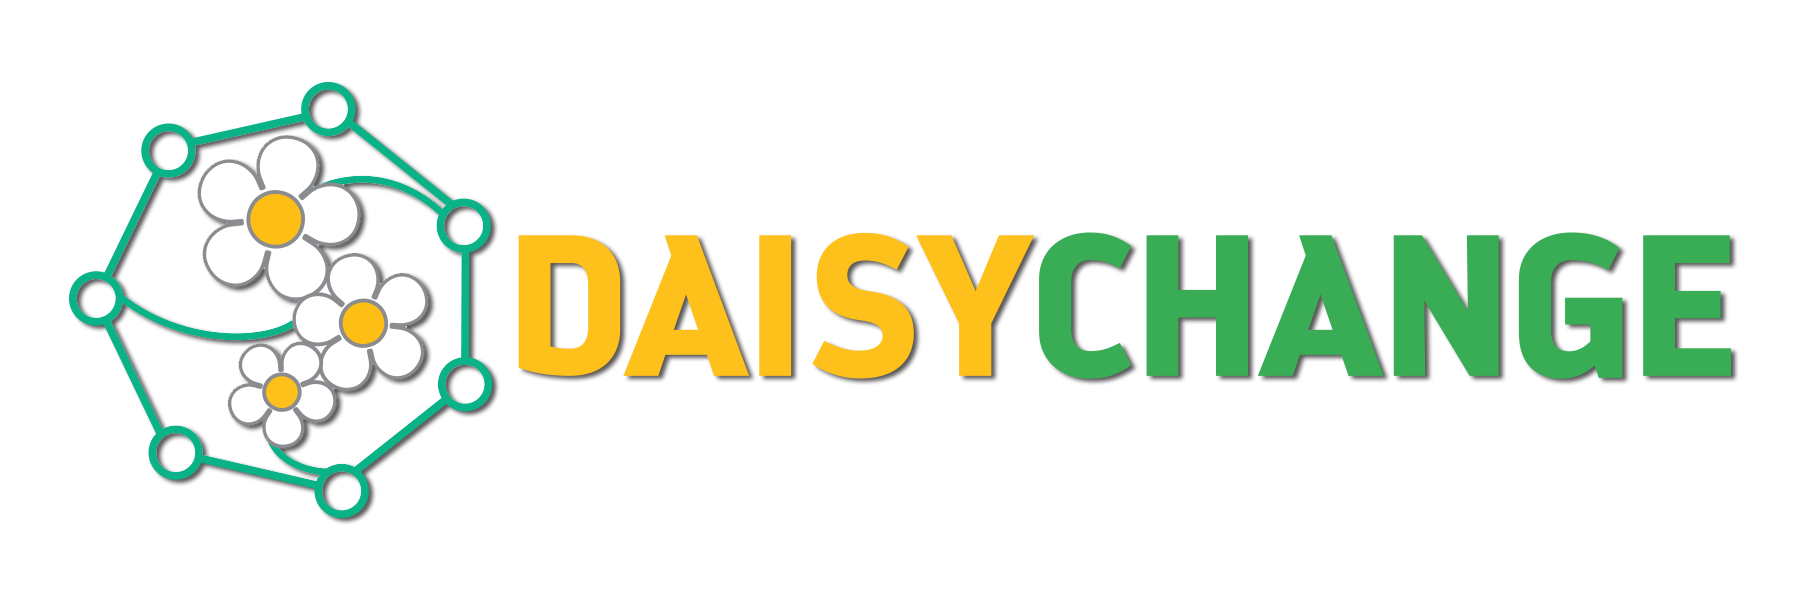 DaisyChange logo LG copy.png